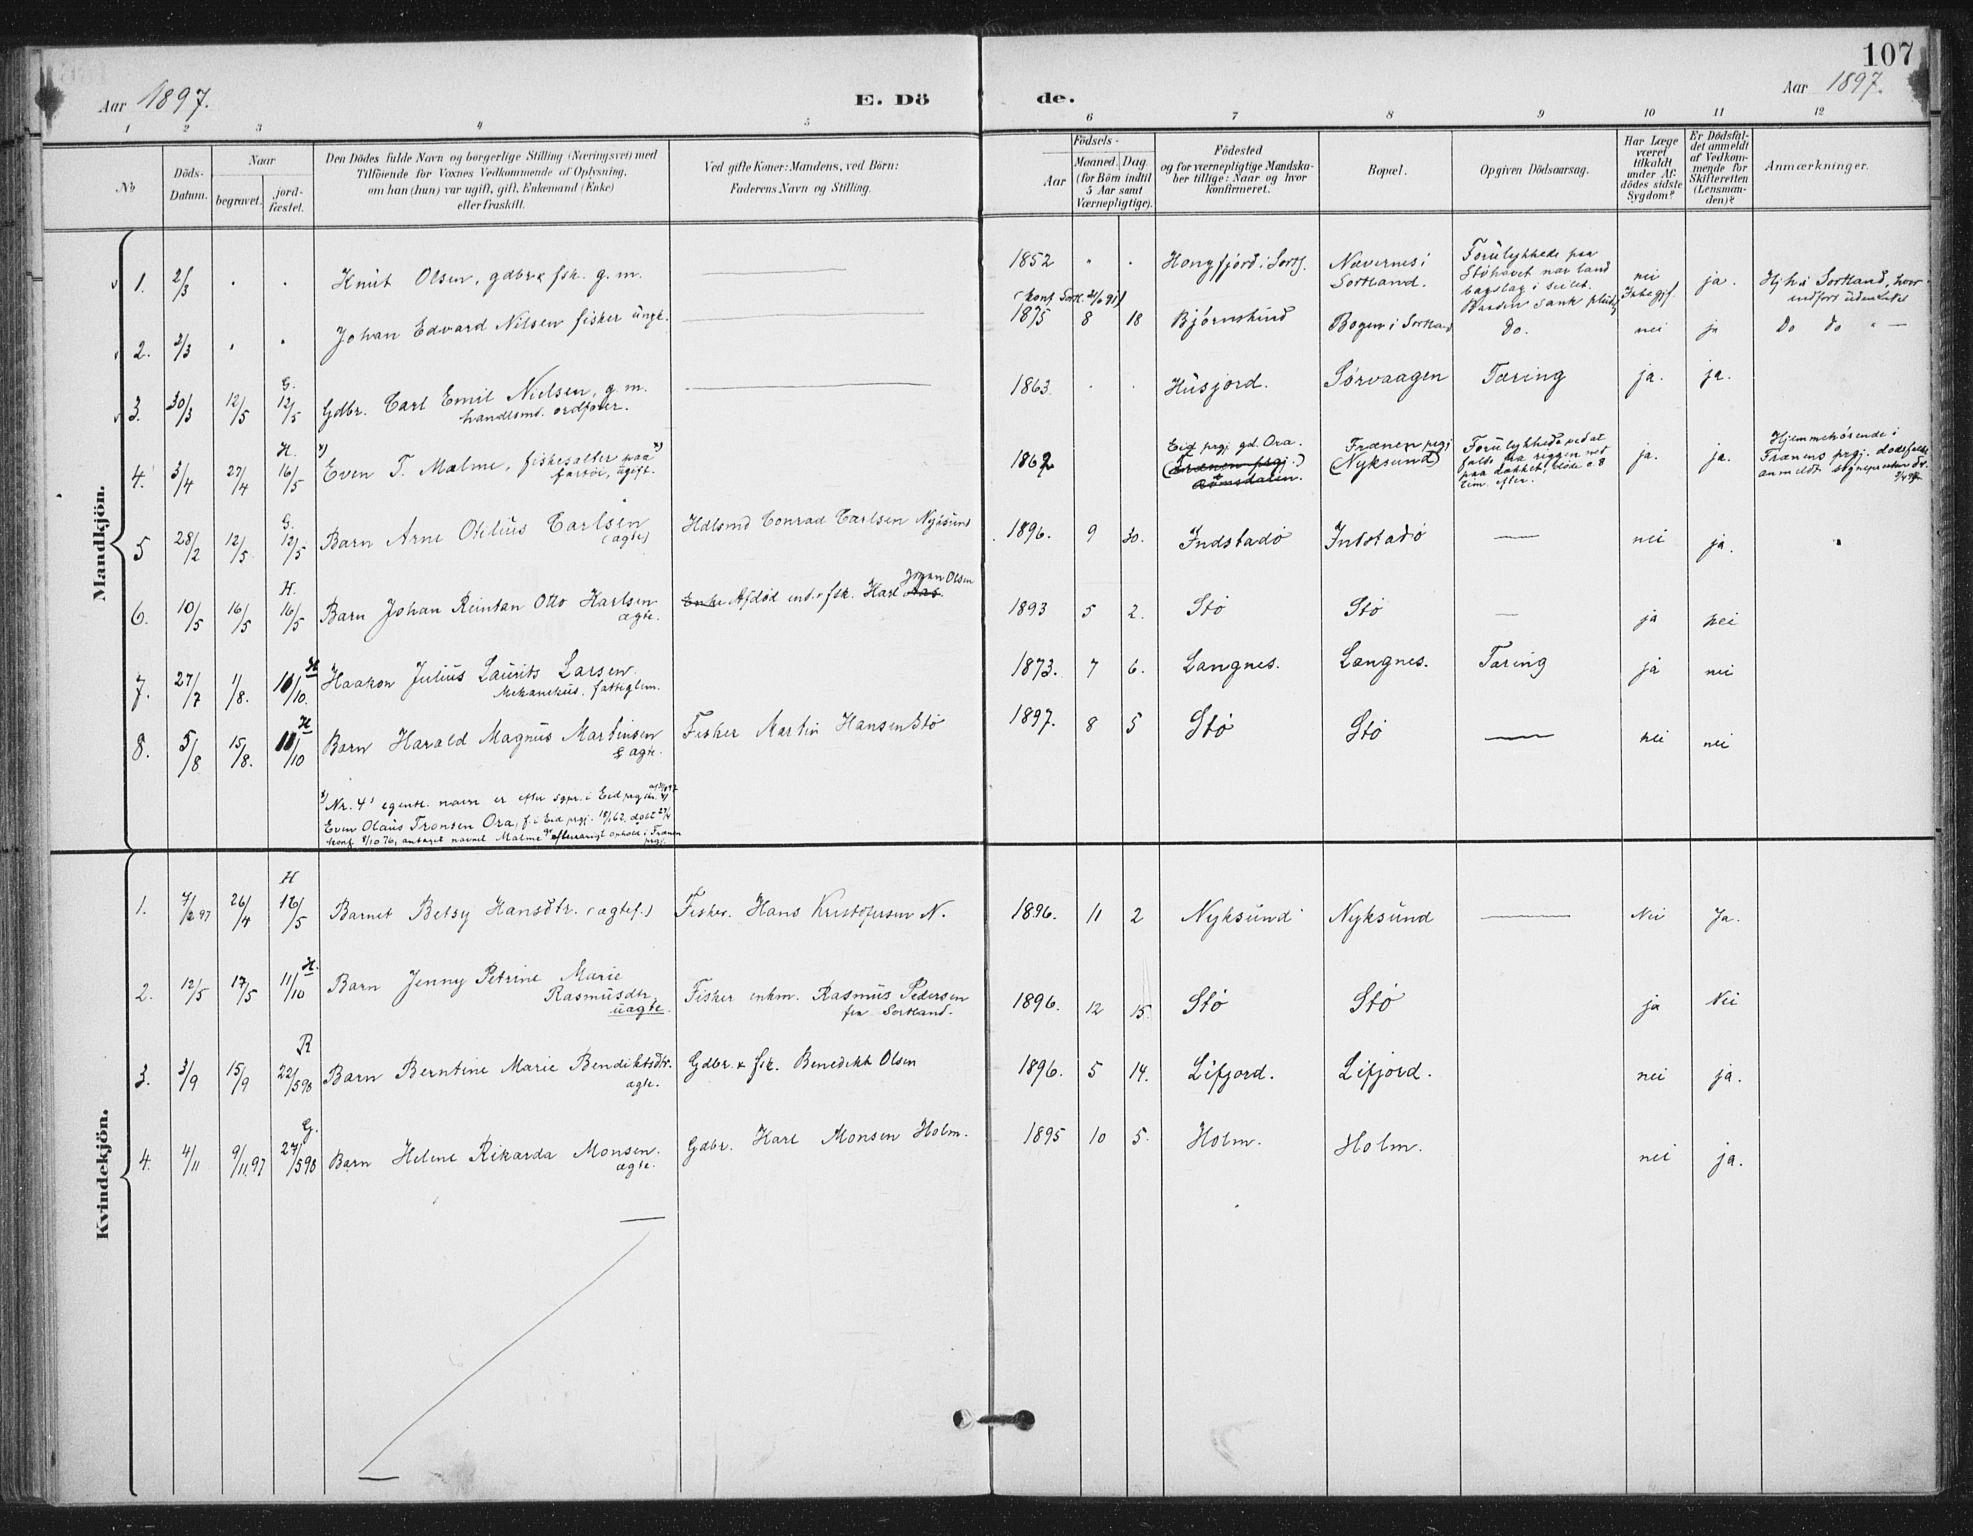 SAT, Ministerialprotokoller, klokkerbøker og fødselsregistre - Nordland, 894/L1356: Ministerialbok nr. 894A02, 1897-1914, s. 107